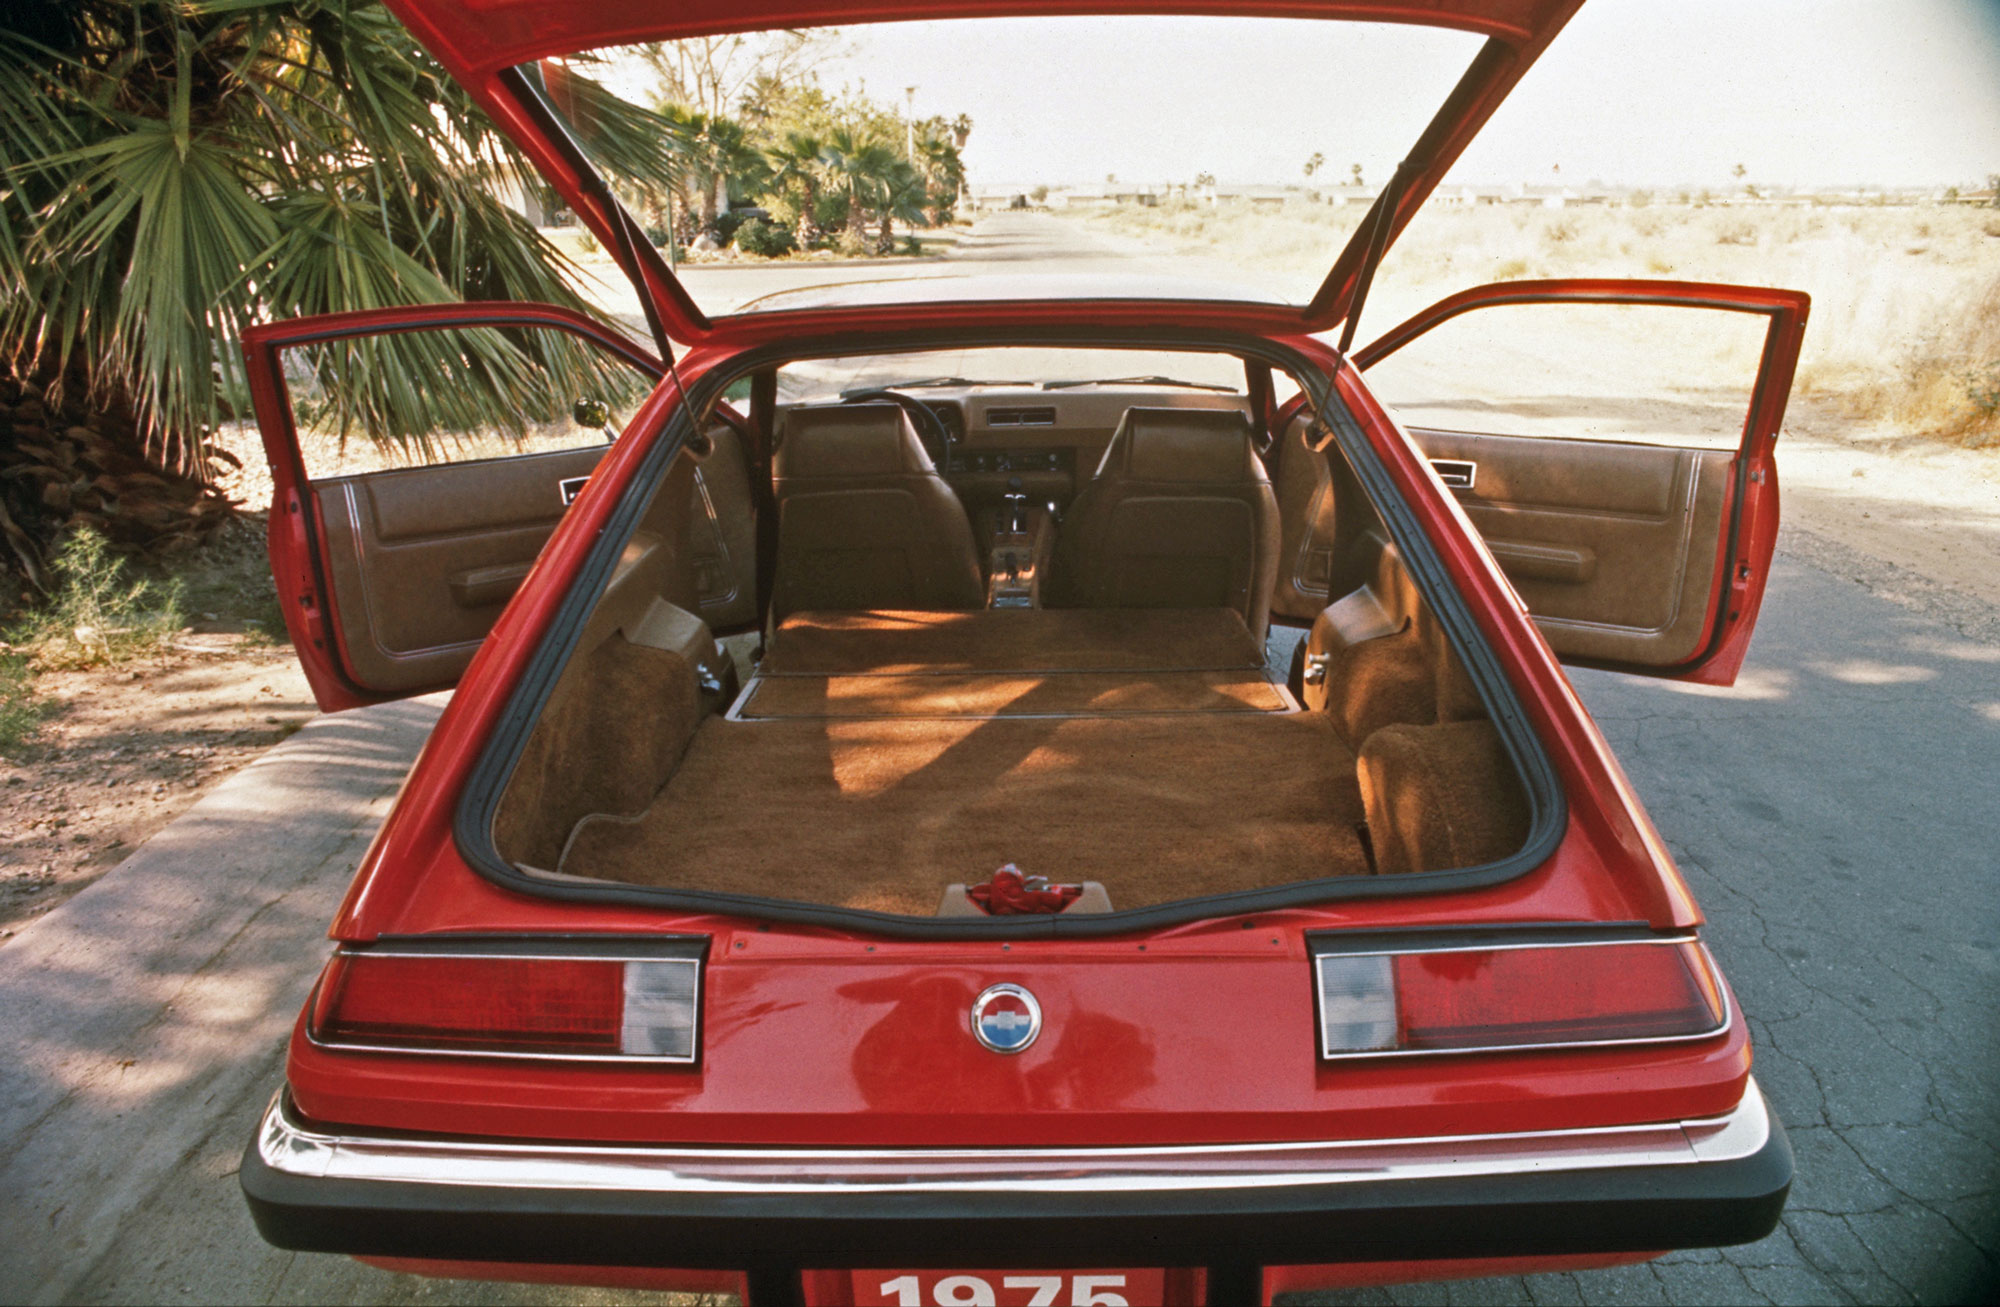 rear interior of Chevy Monza